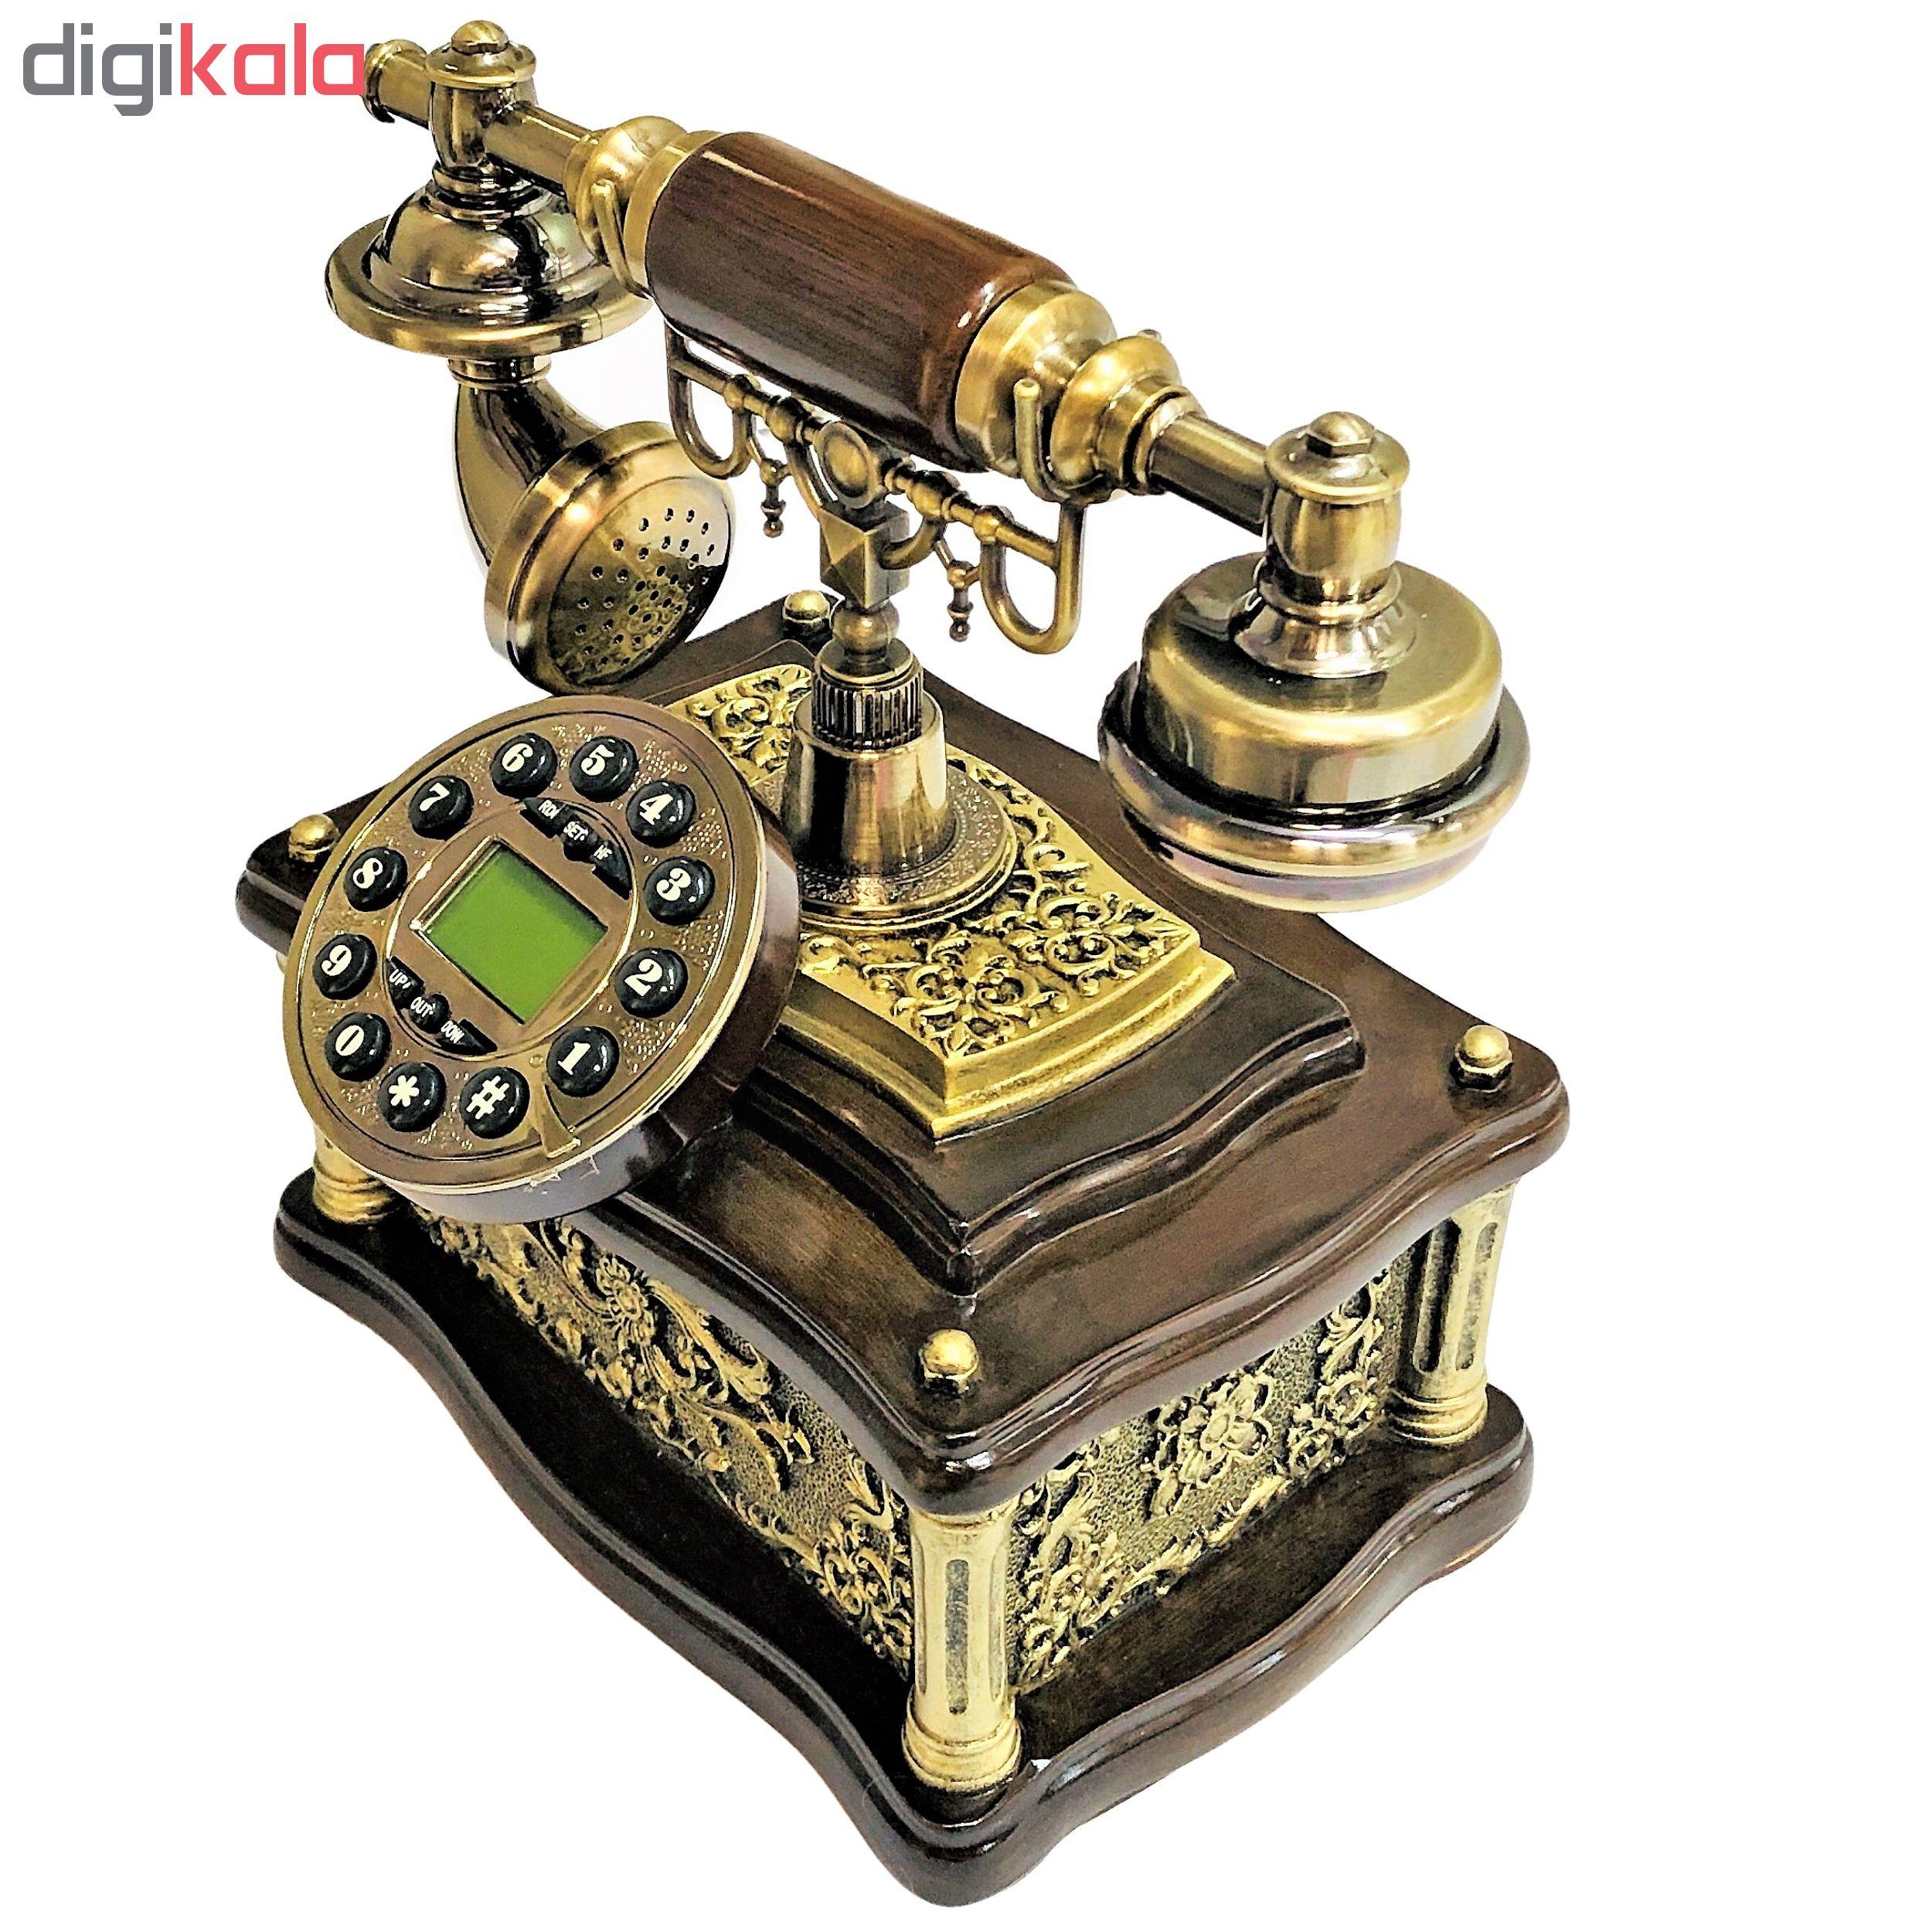 قیمت                      تلفن کلاسیک افق مدل 1200D